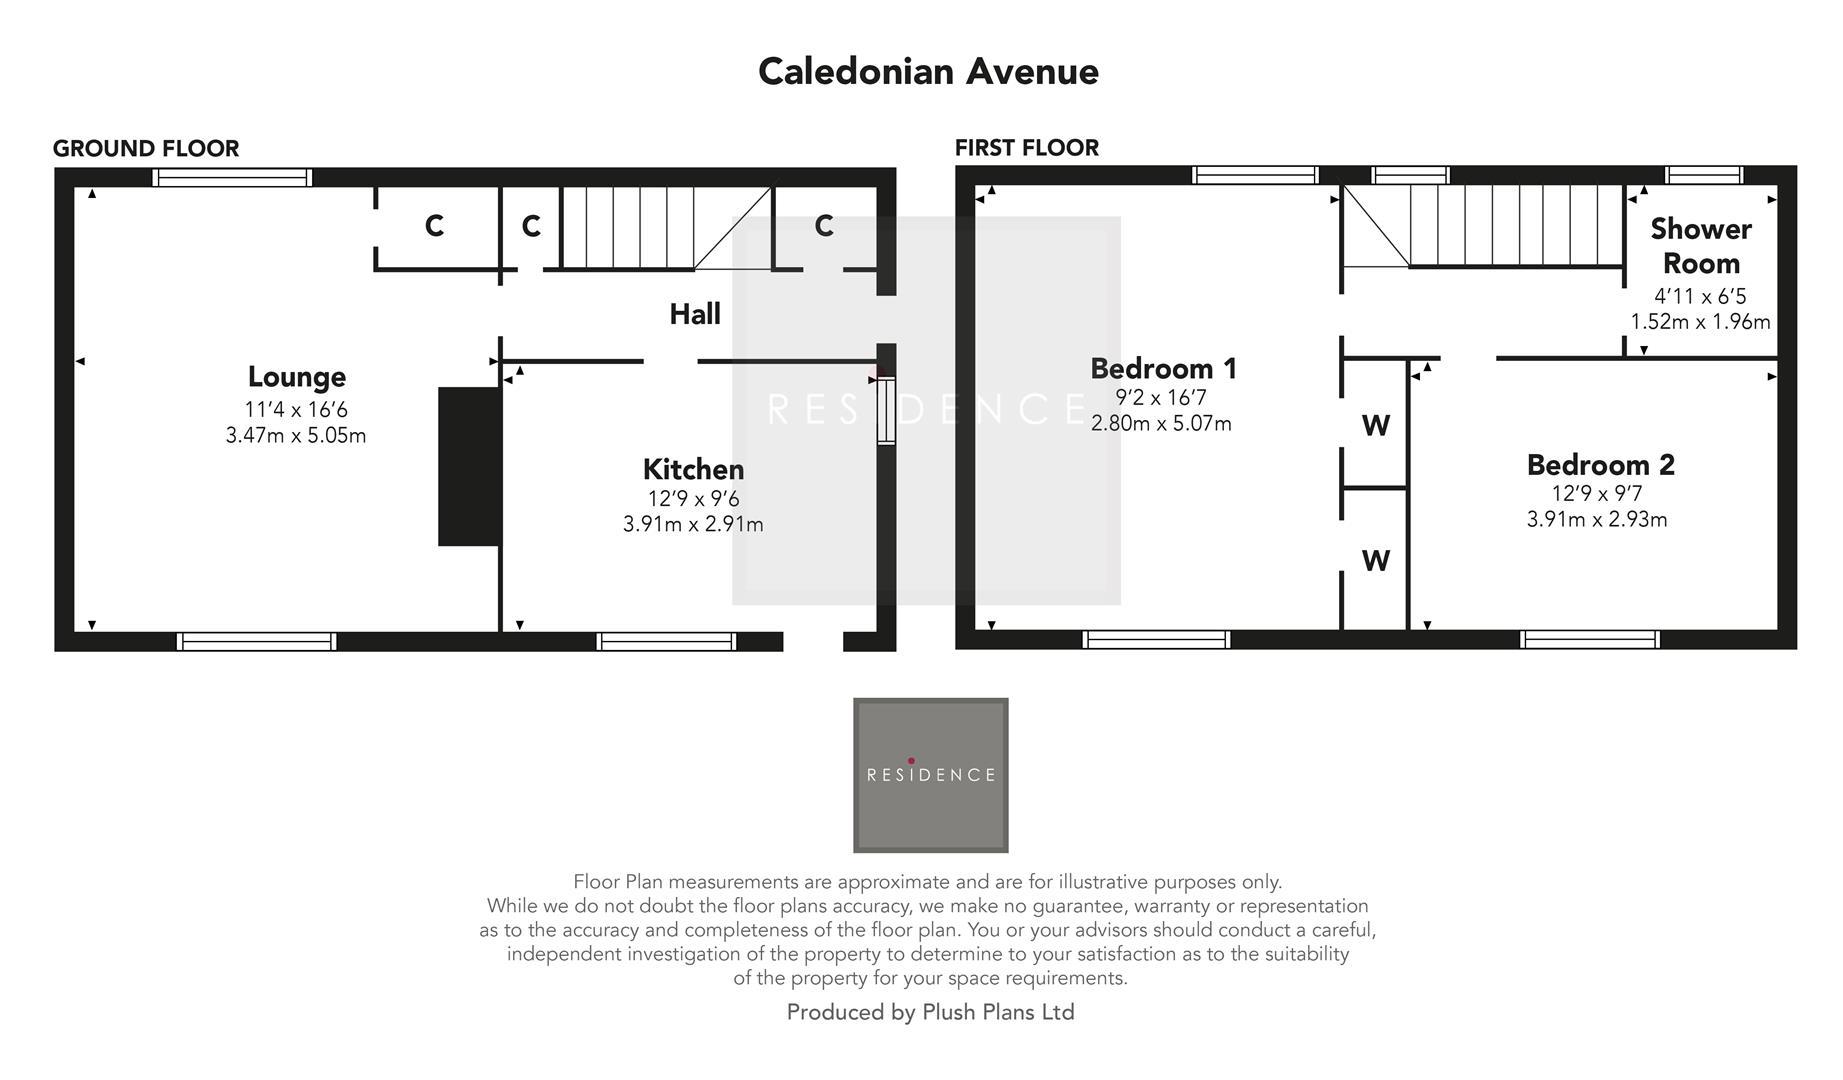 Caledonian Avenue_fp.jpg